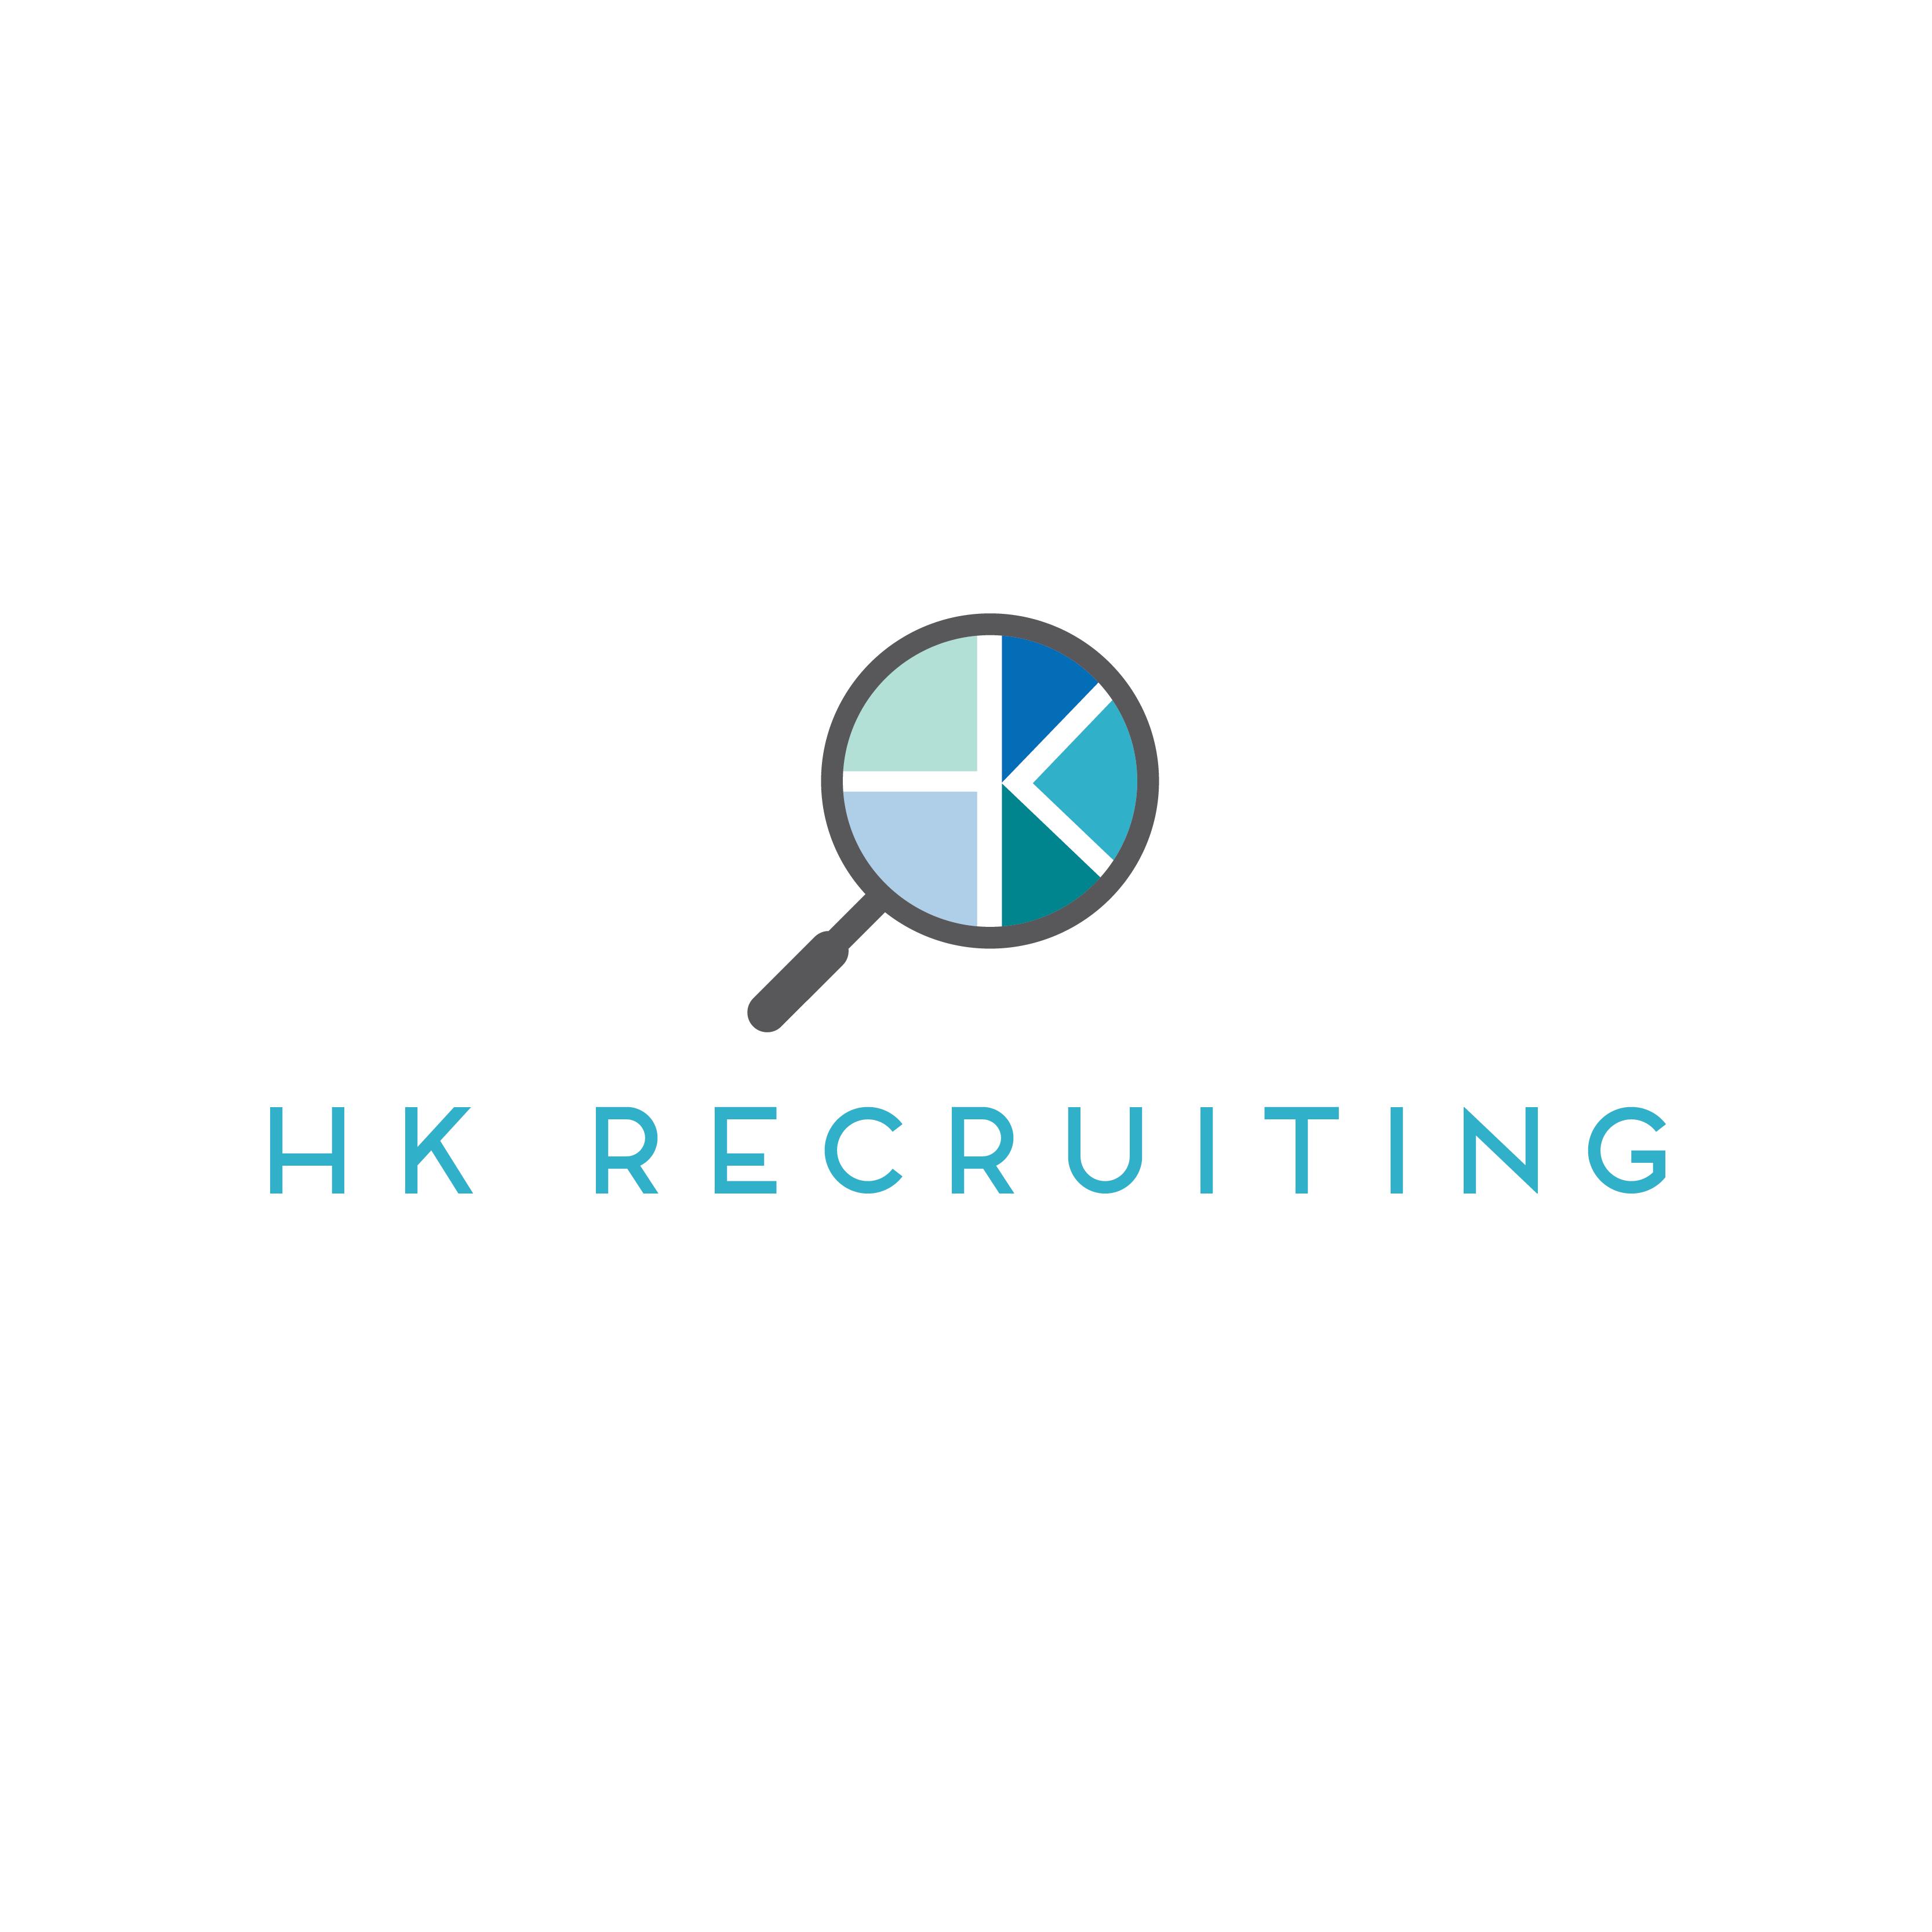 HK Recruiting